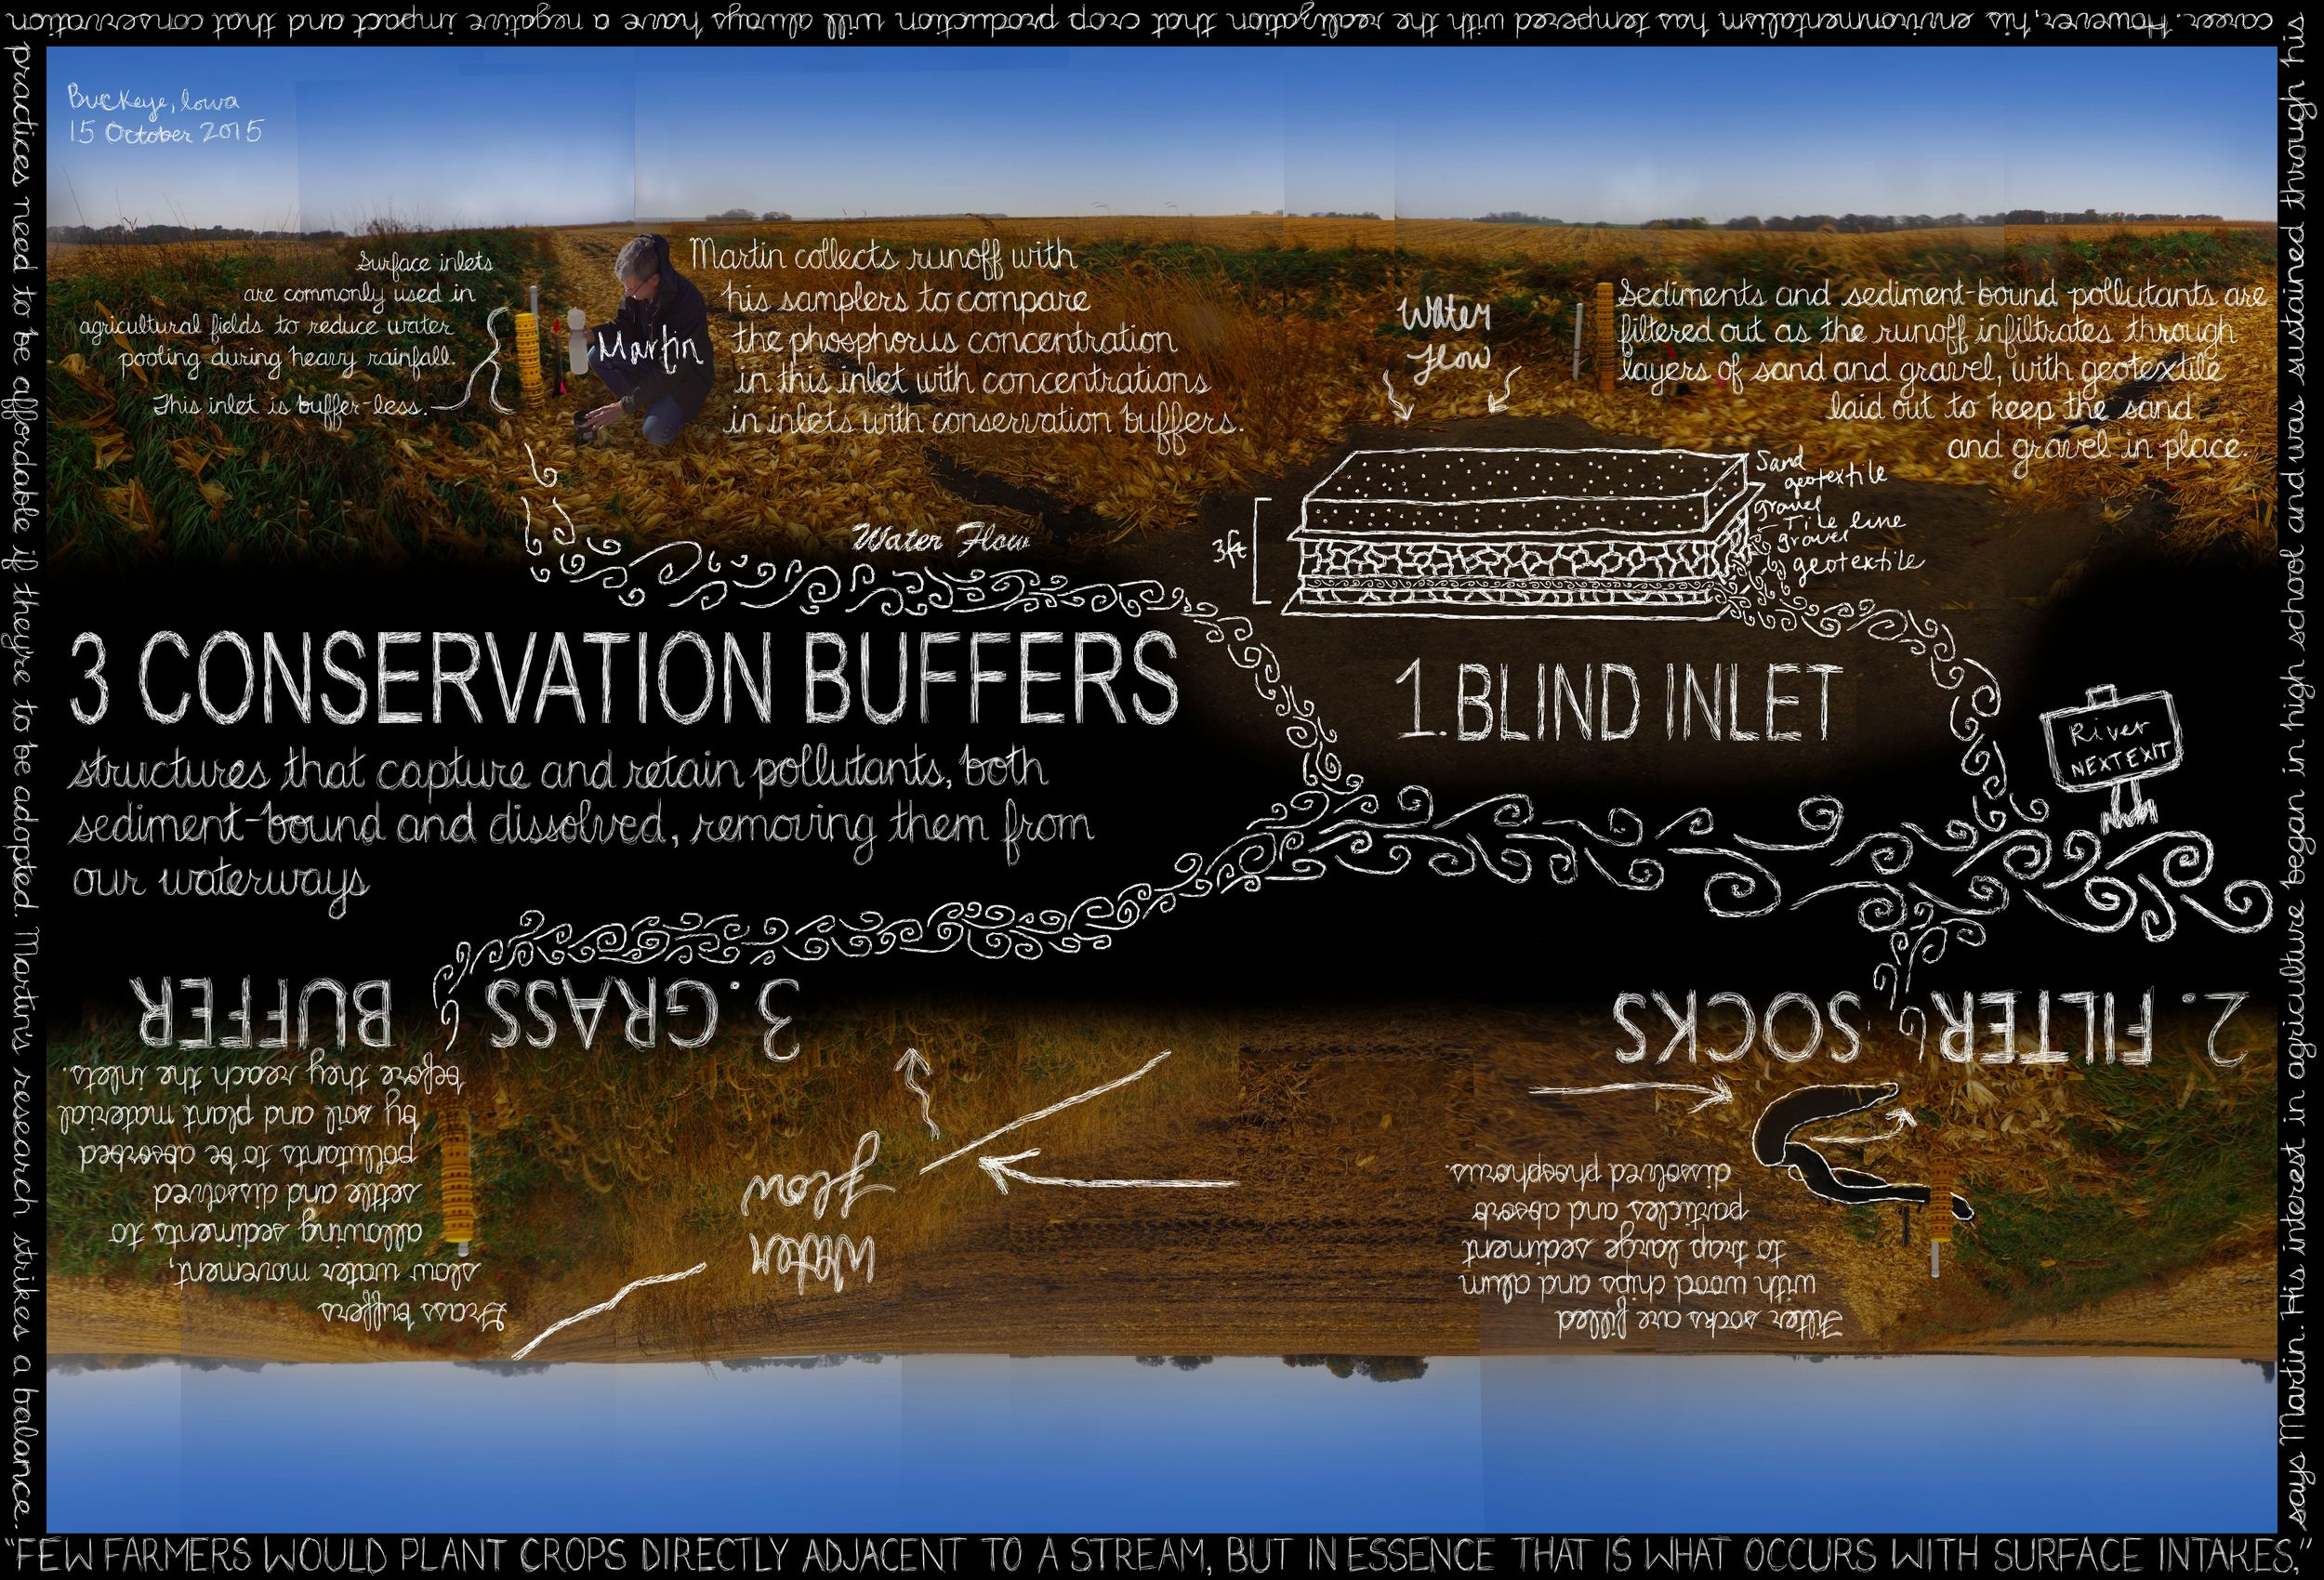 PL_Ames_ConservationBuffers_small.jpg